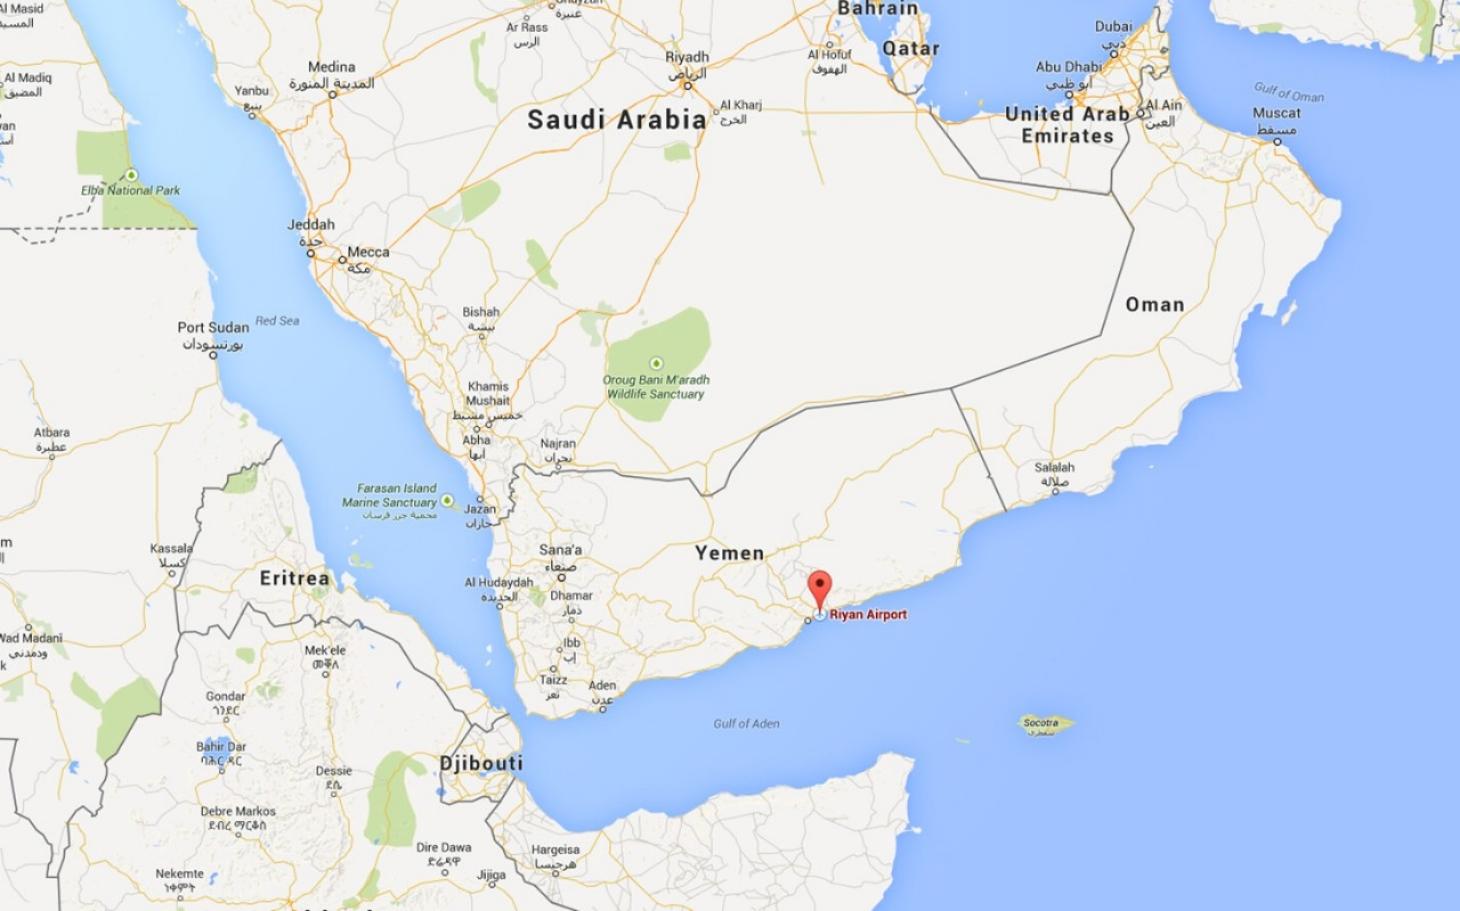 Al-Qaeda Takes Over Airport in Yemen   Al Jazeera America